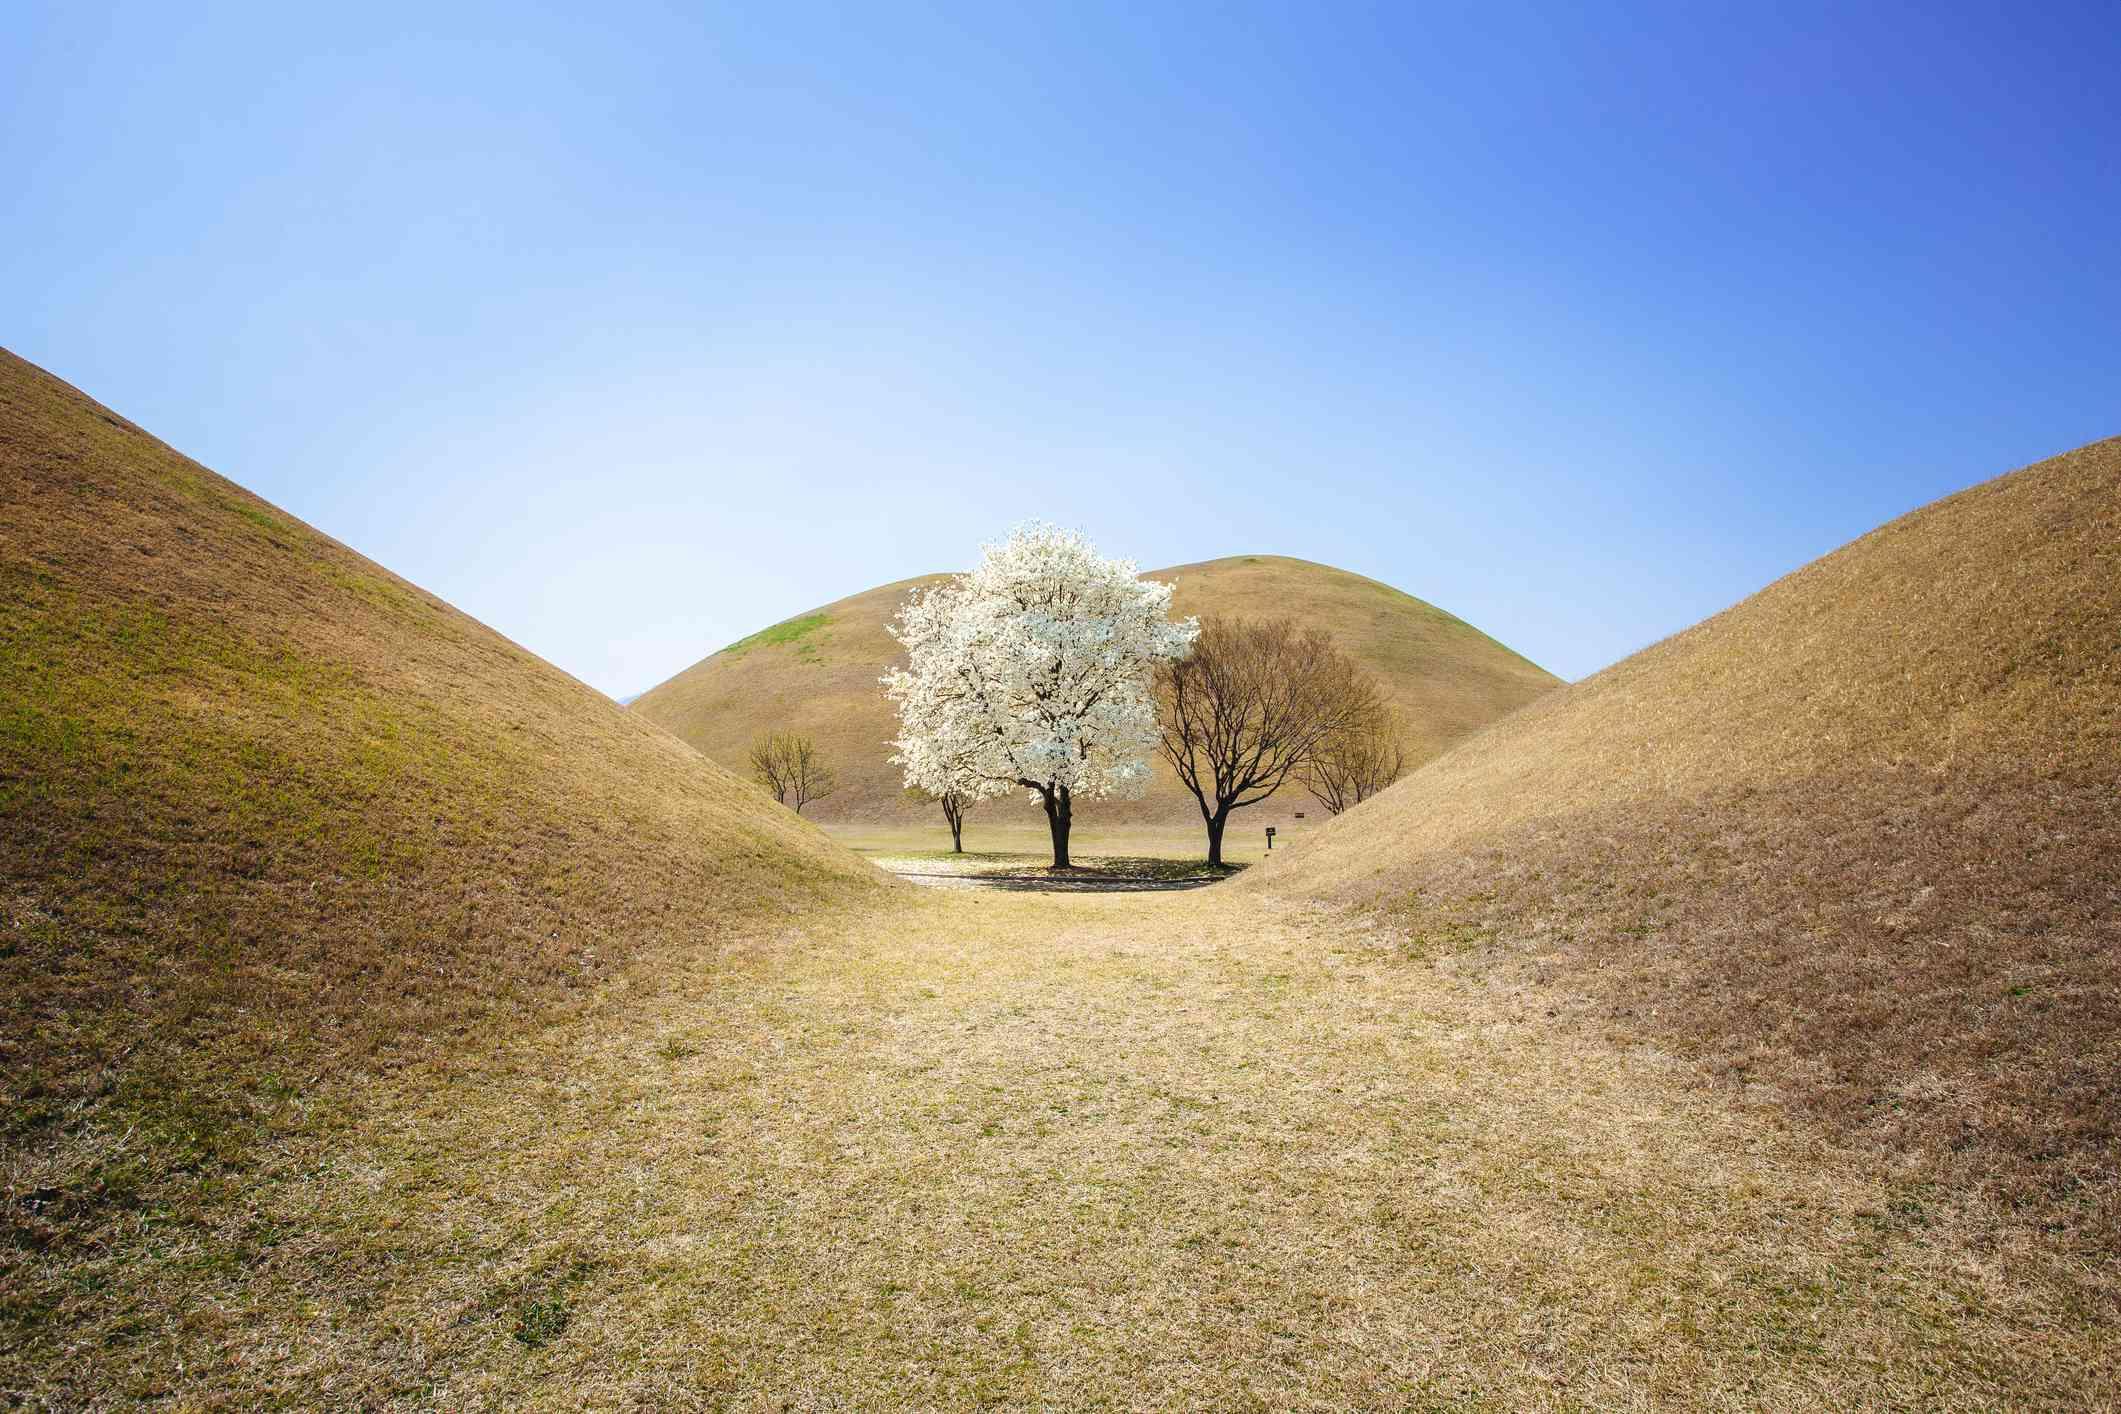 Otherworldly hills in Tumuli Park, Gyeongju, South Korea